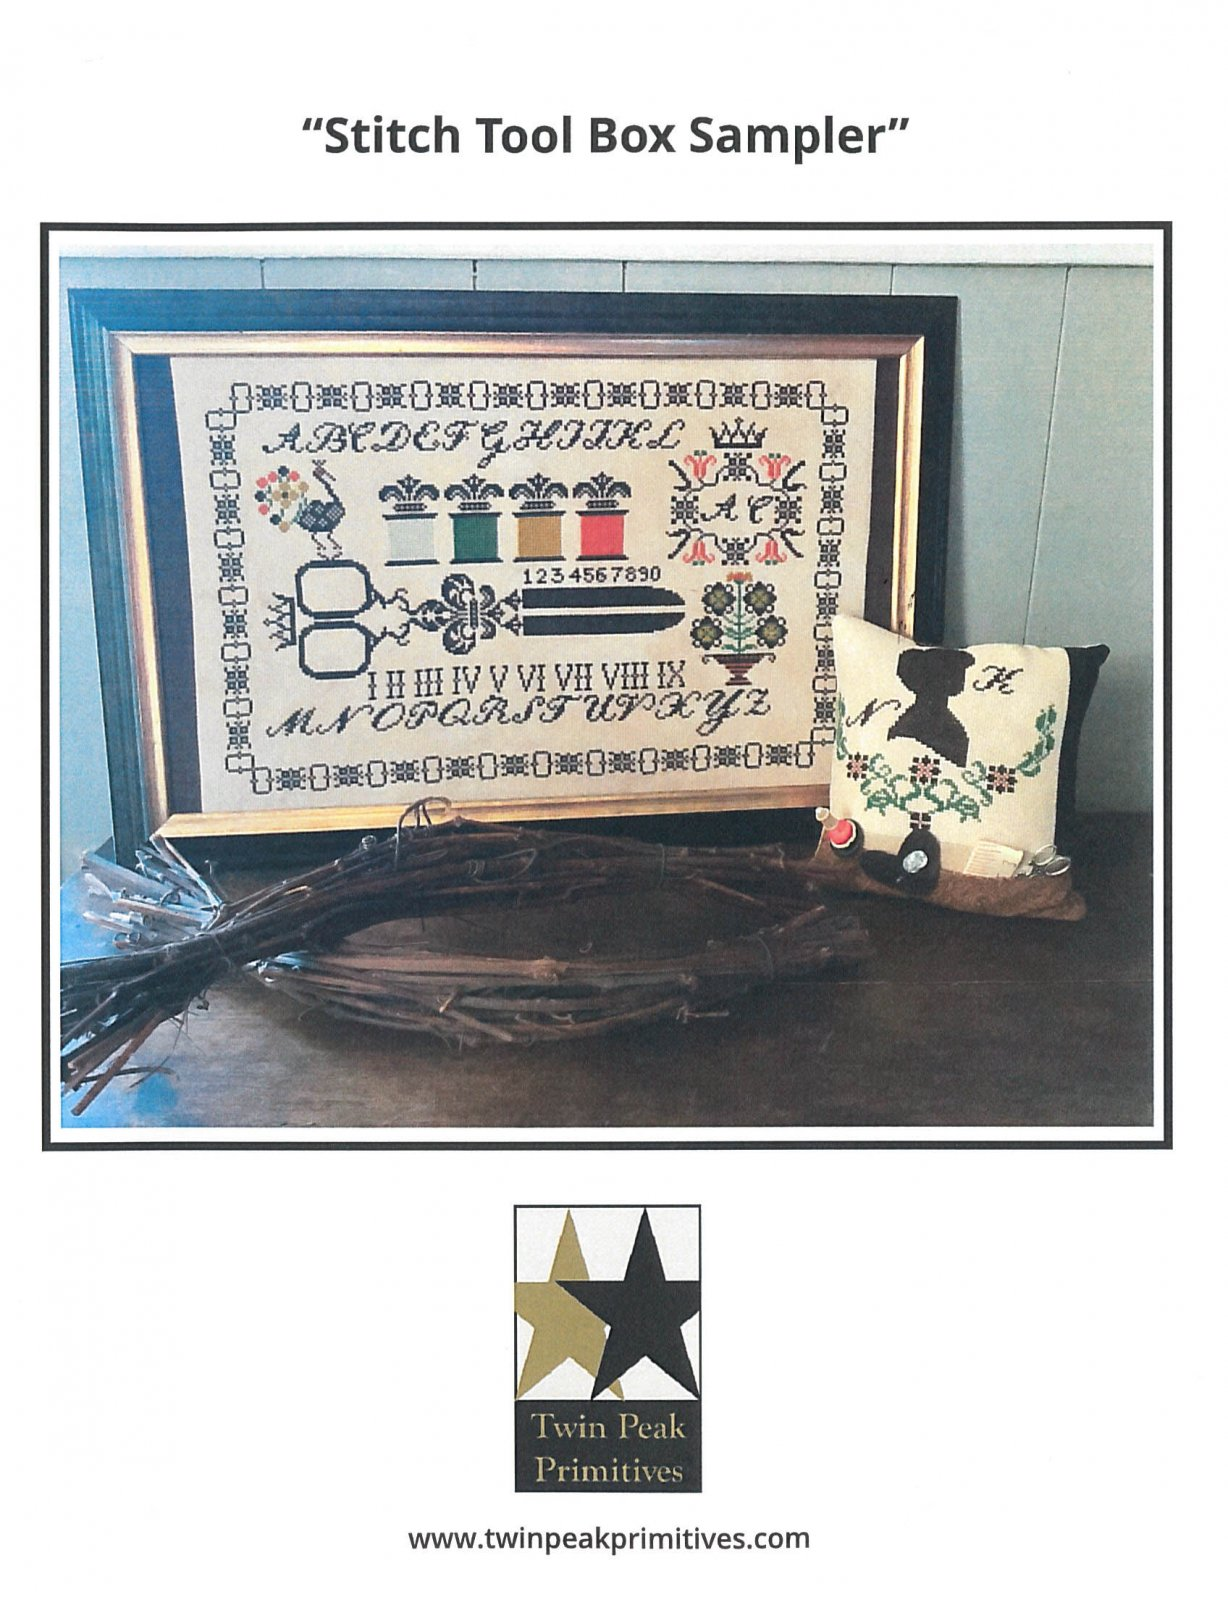 Stitch Tool Box Sampler ~ Twin Peak